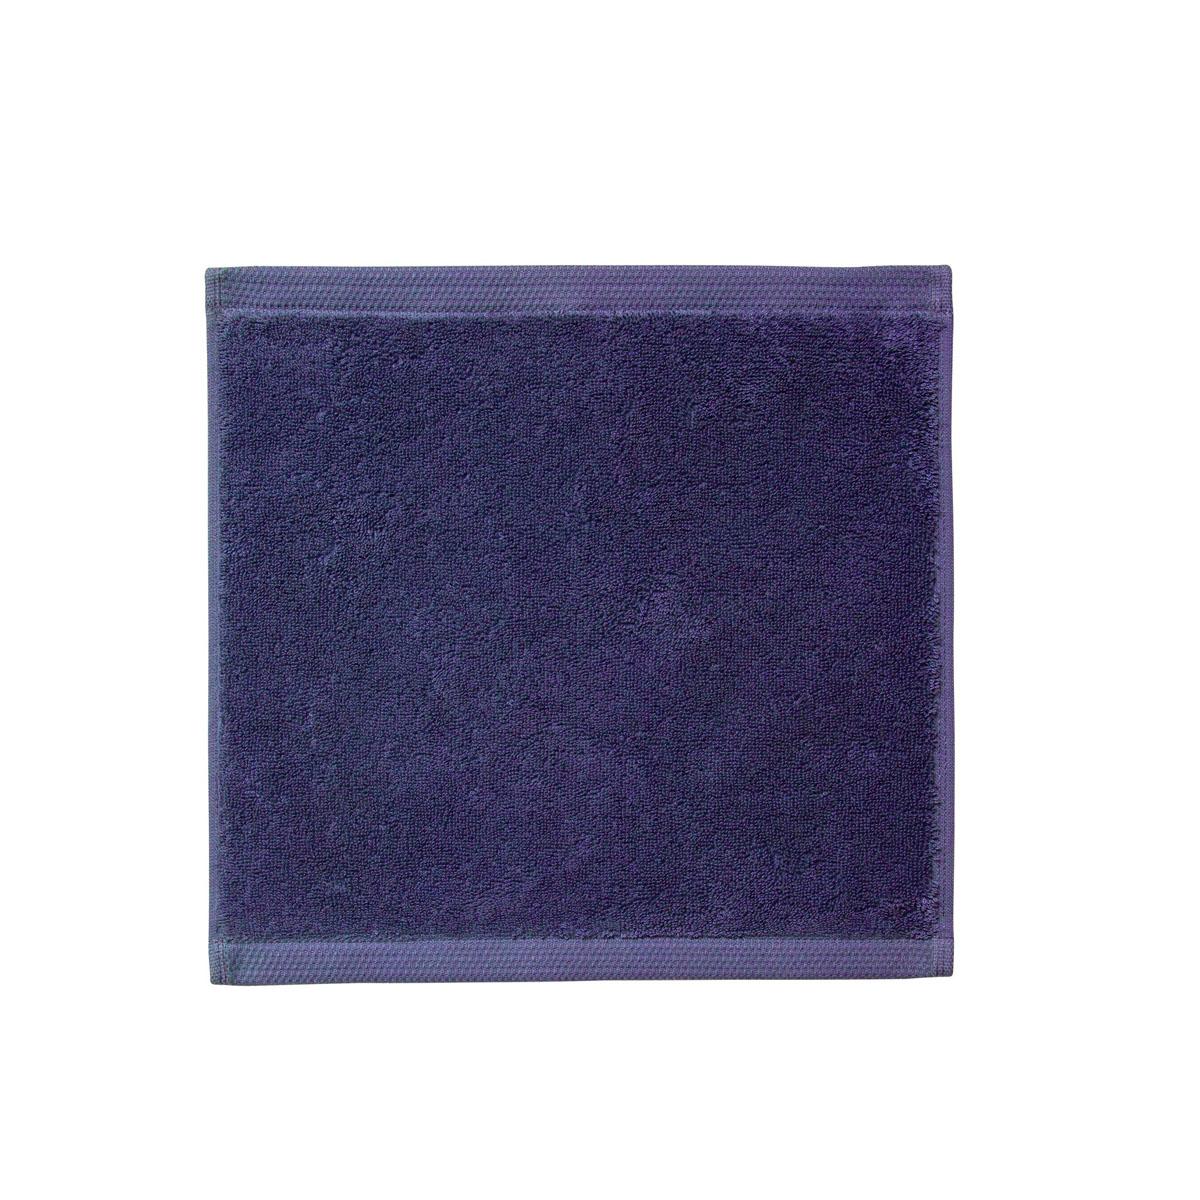 Carré visage en bleu marine 30x30